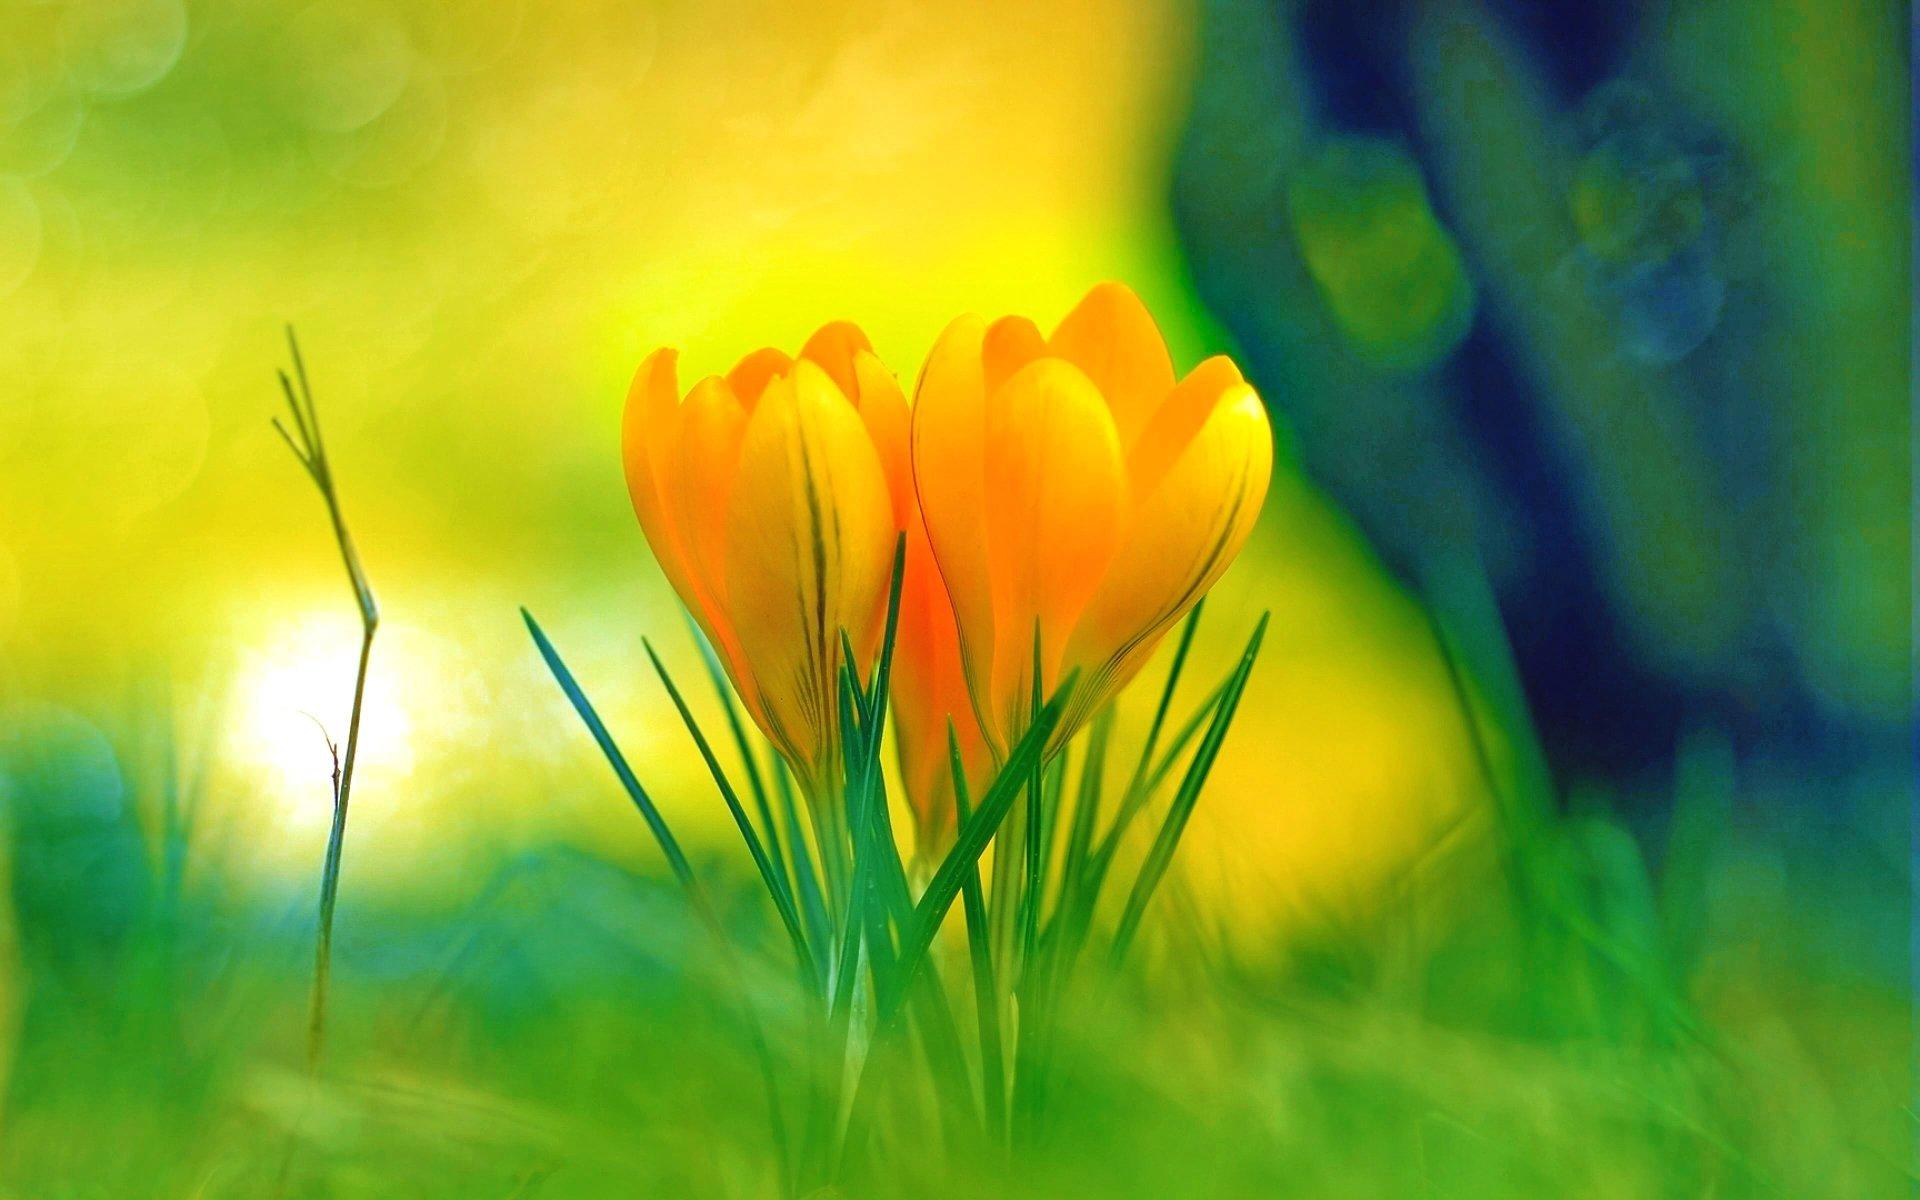 Earth - Crocus  Flower Yellow Flower Spring Wallpaper